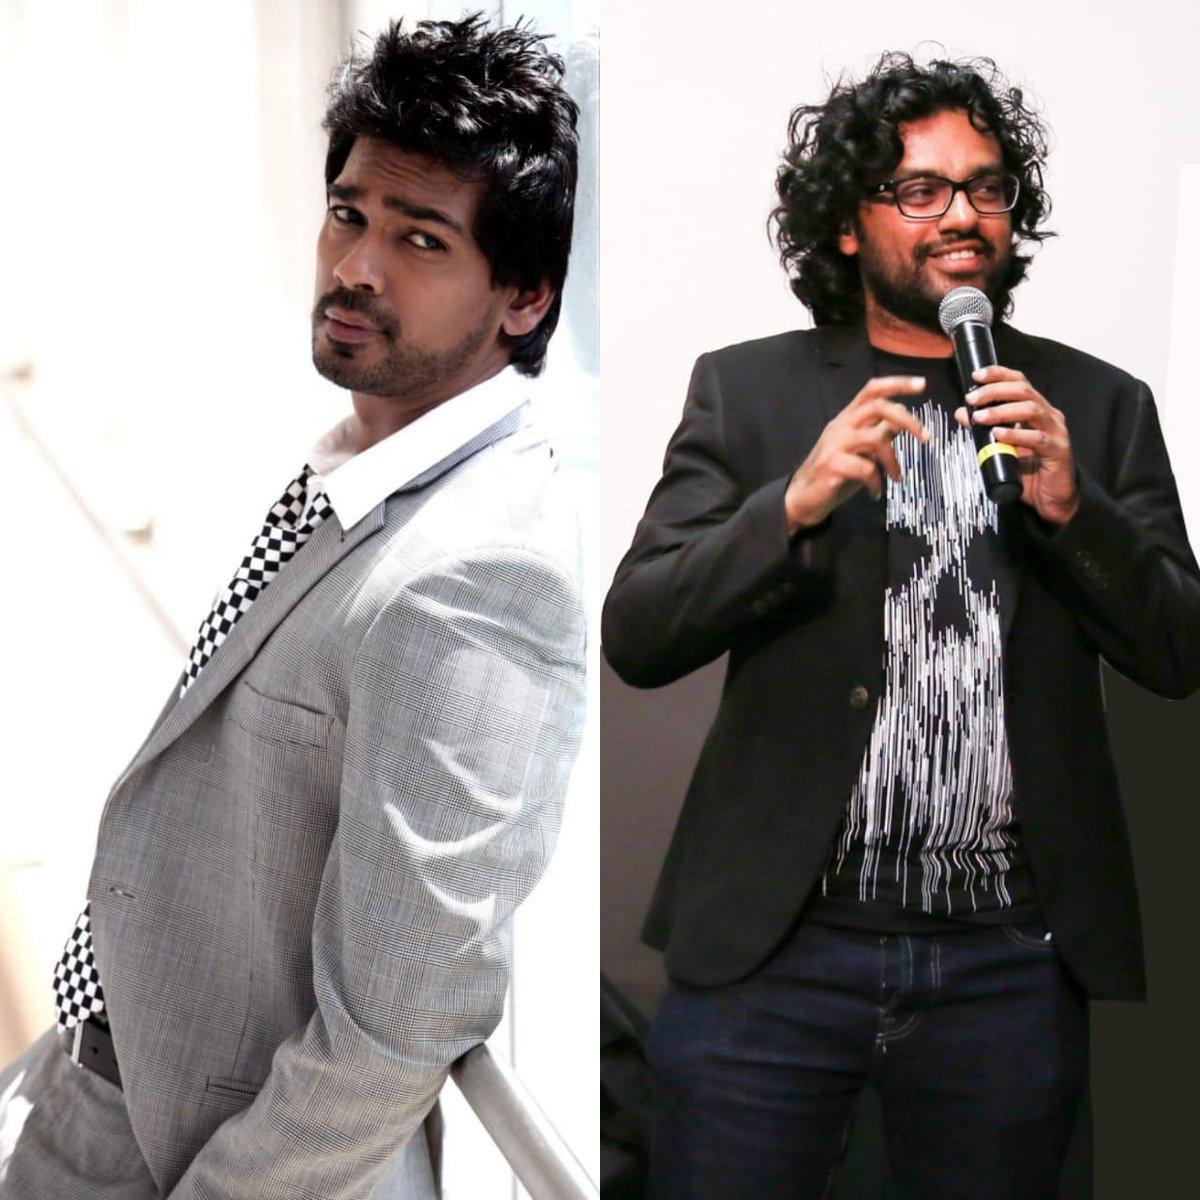 Eminent Film Producer  ( Veere Di Wedding & Dabangg-3 fame ) #NikhilDwivedi will be producing a 3 film franchise on #Nagin, which will be directed by award winning director #VishalFuria of #Lapachhapi fame . @Nikhil_Dwivedi @FuriaVishal